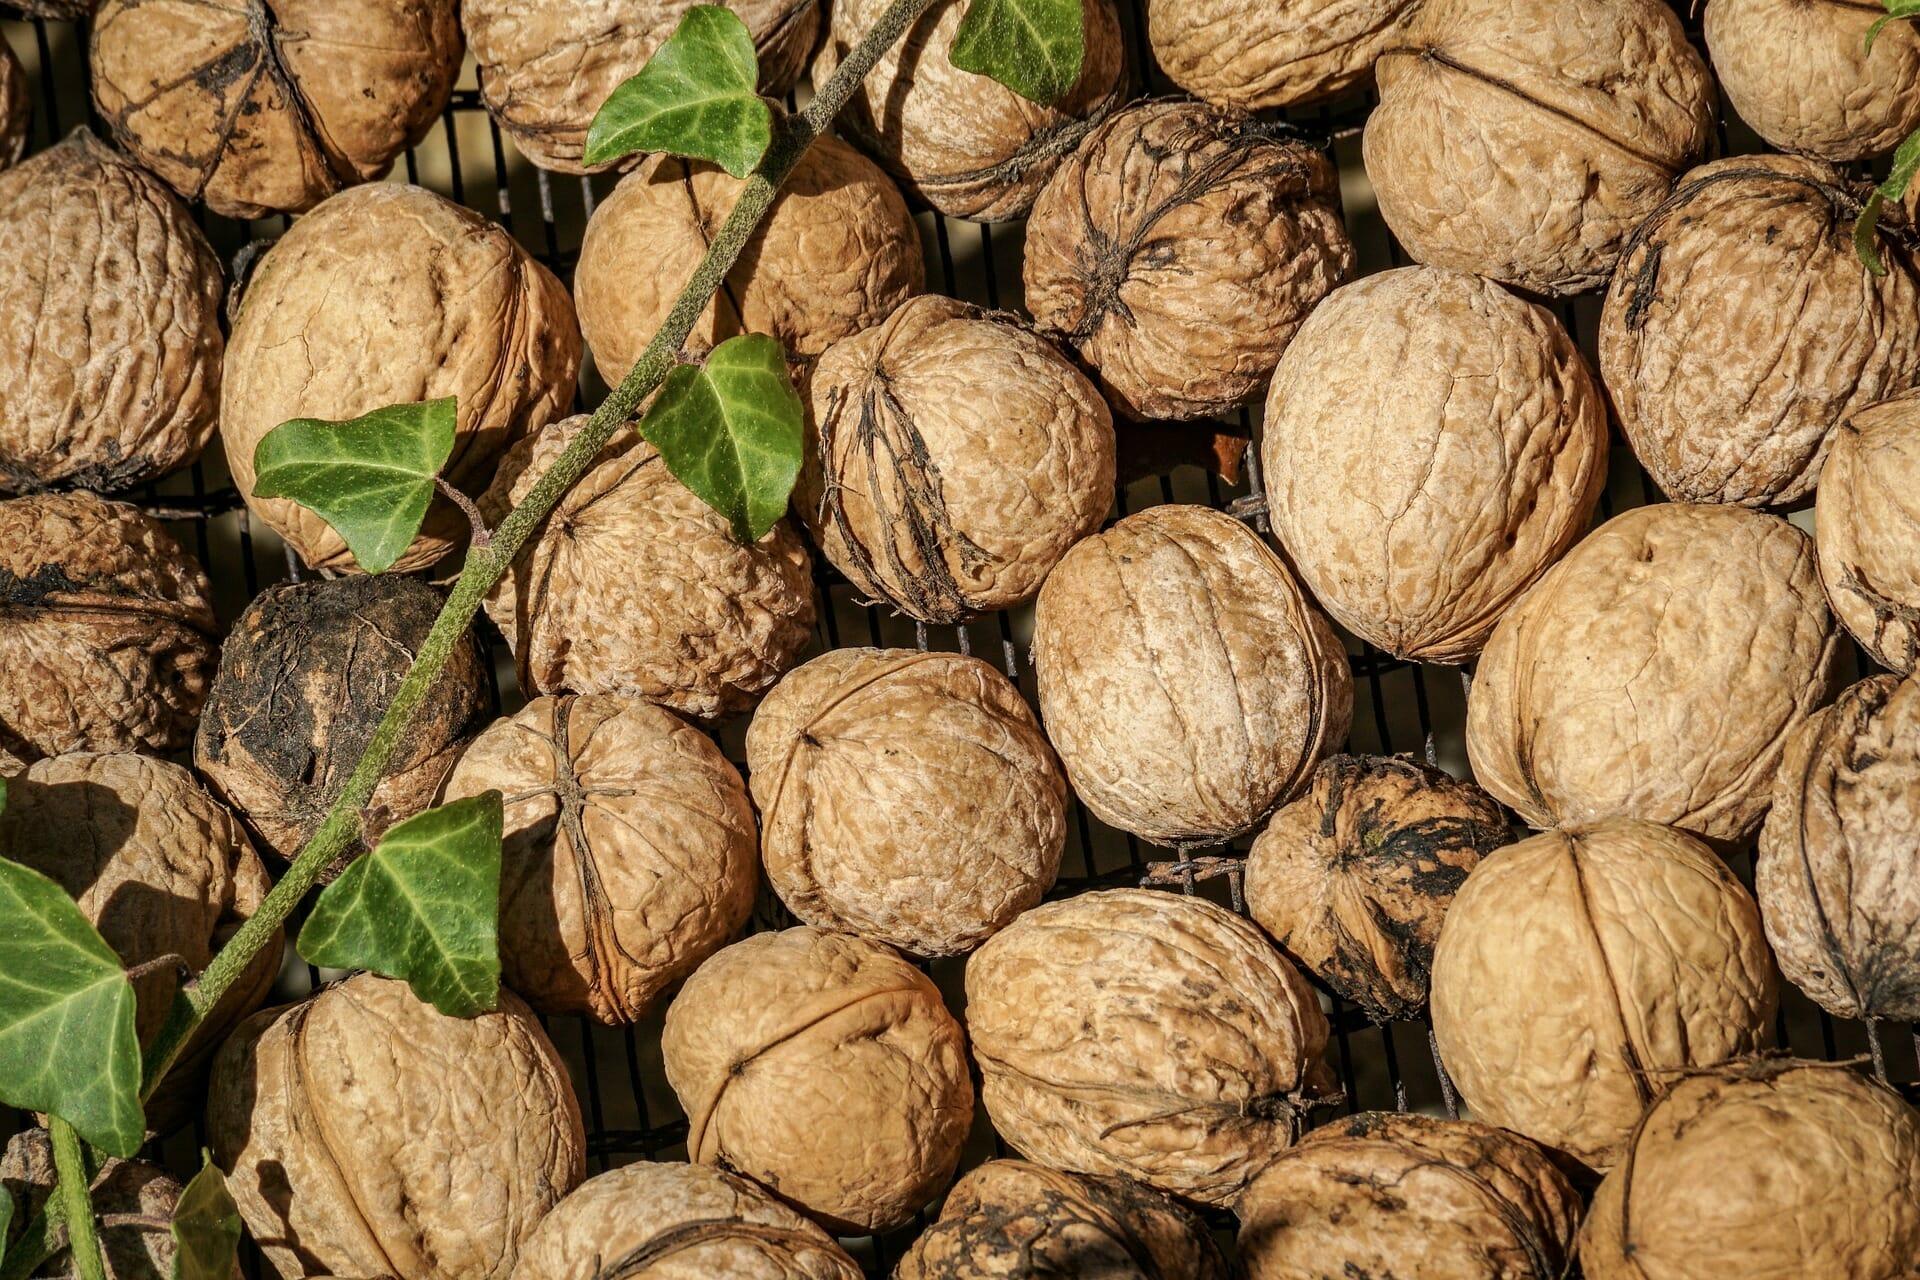 nuts-3747483_1920